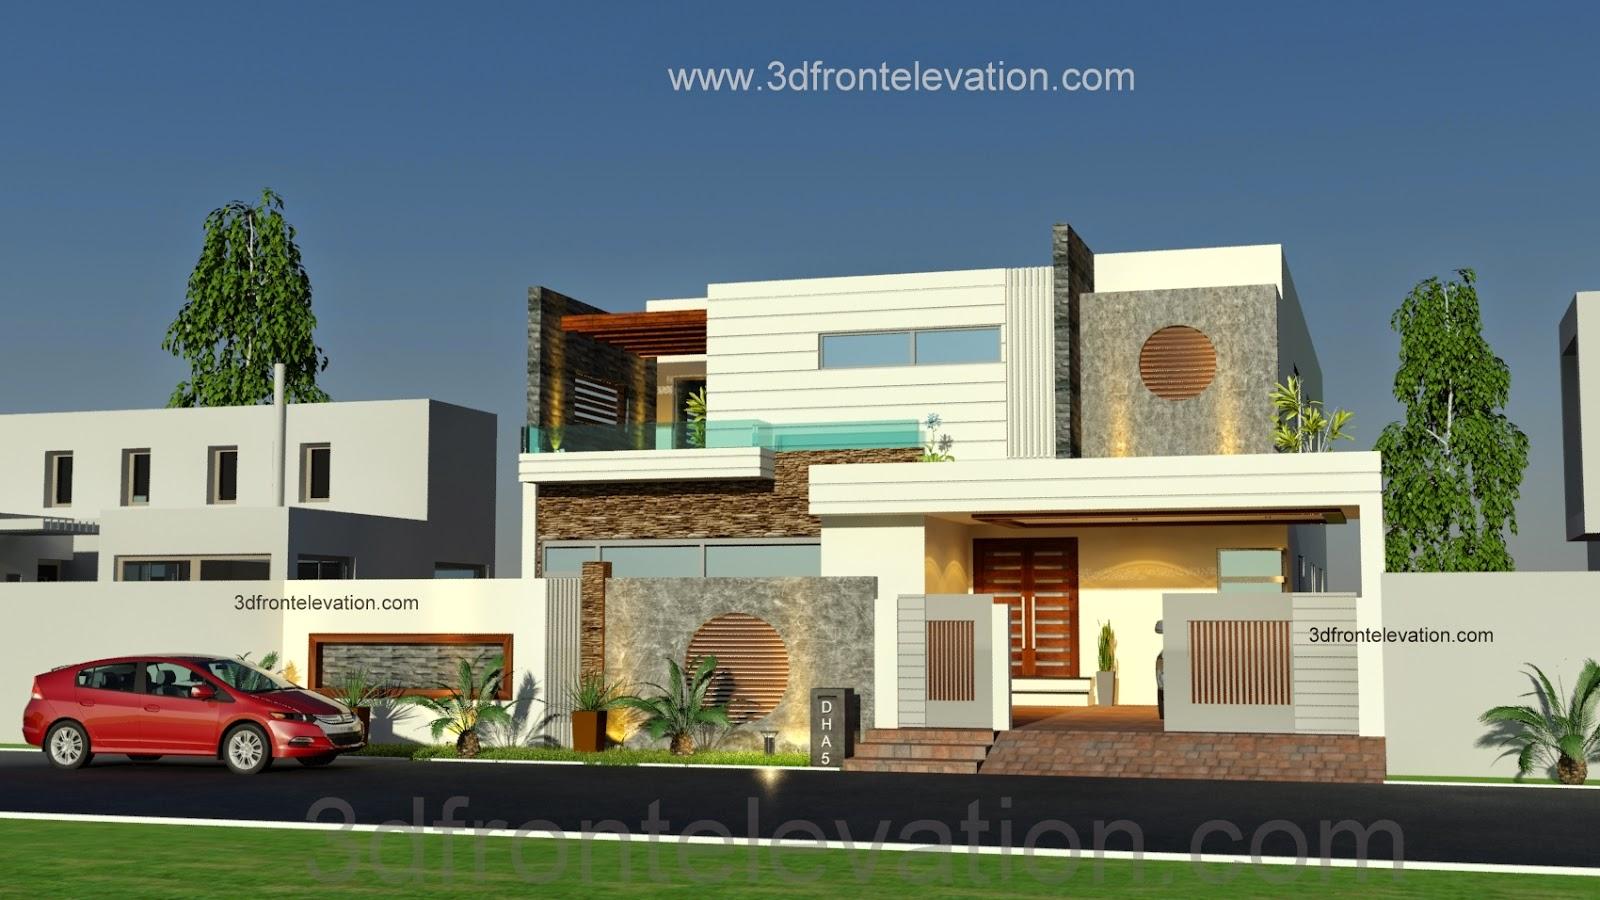 Front Elevation Design Hotel : Hotel elevation designs joy studio design gallery best